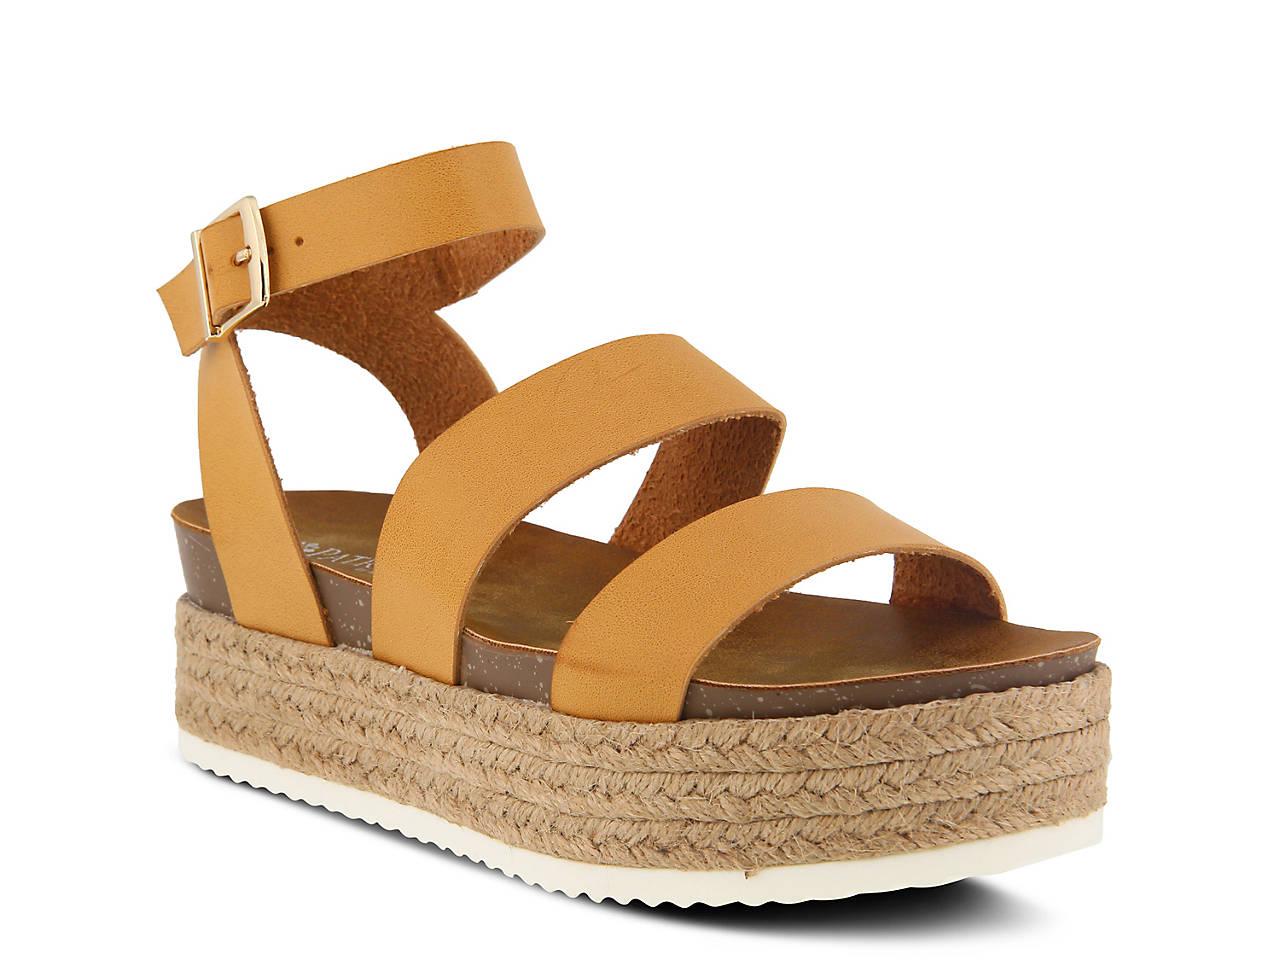 10a6876f7313 Patrizia by Spring Step Larissa Espadrille Platform Sandal Women s ...